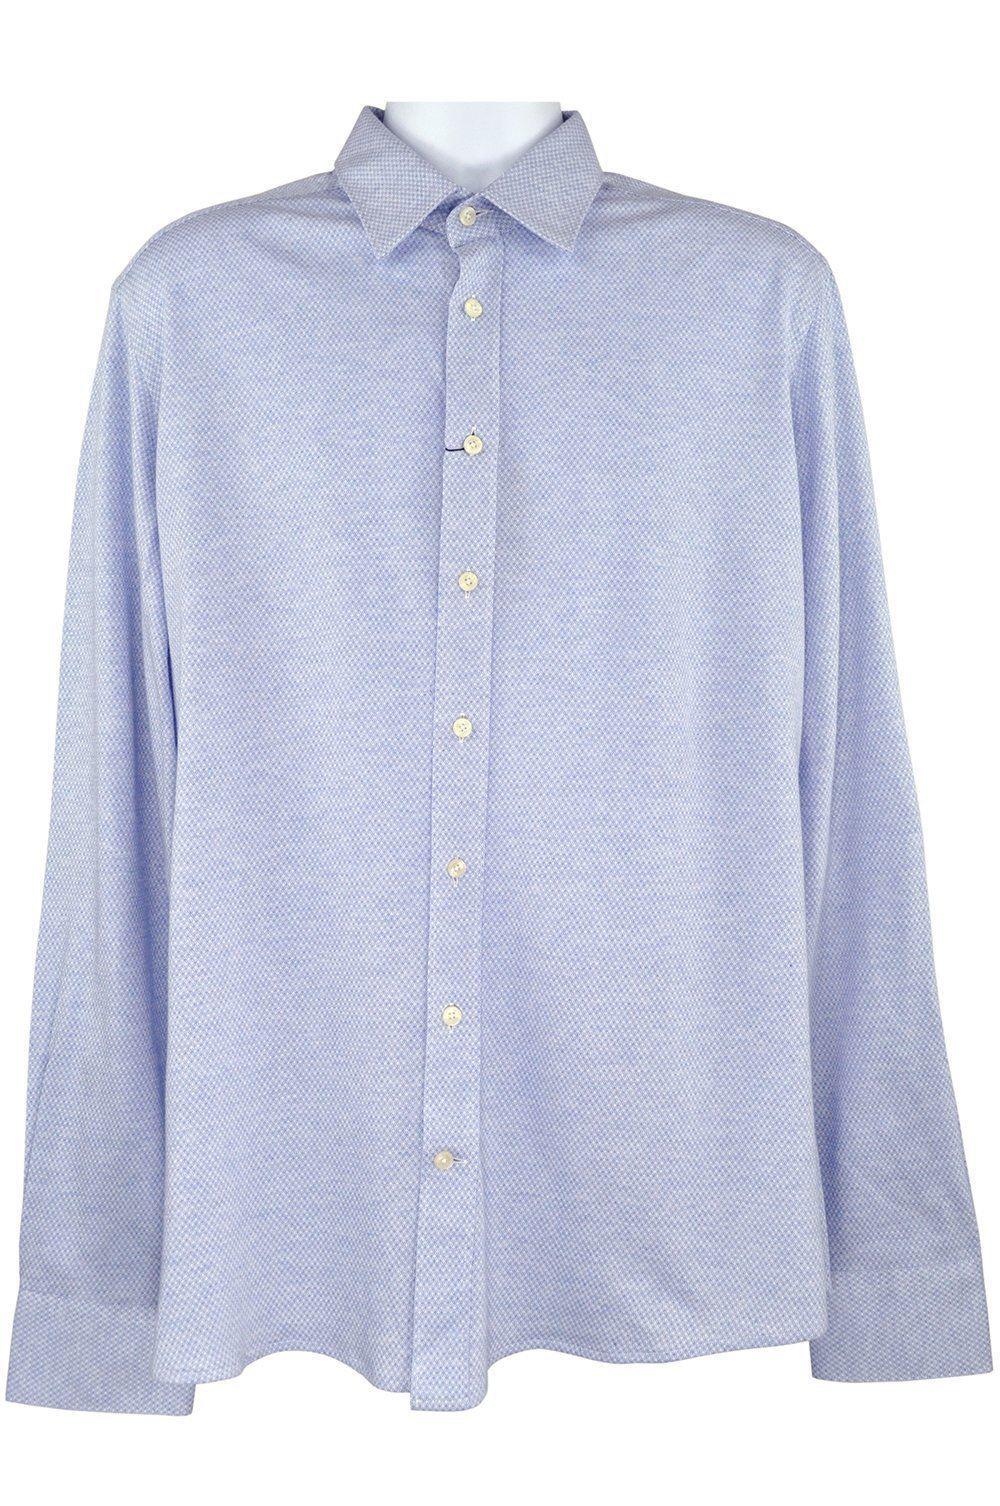 Hackett bleu clair Chemise à manches longues XL 130 RRP 130 XL D196 4476b0